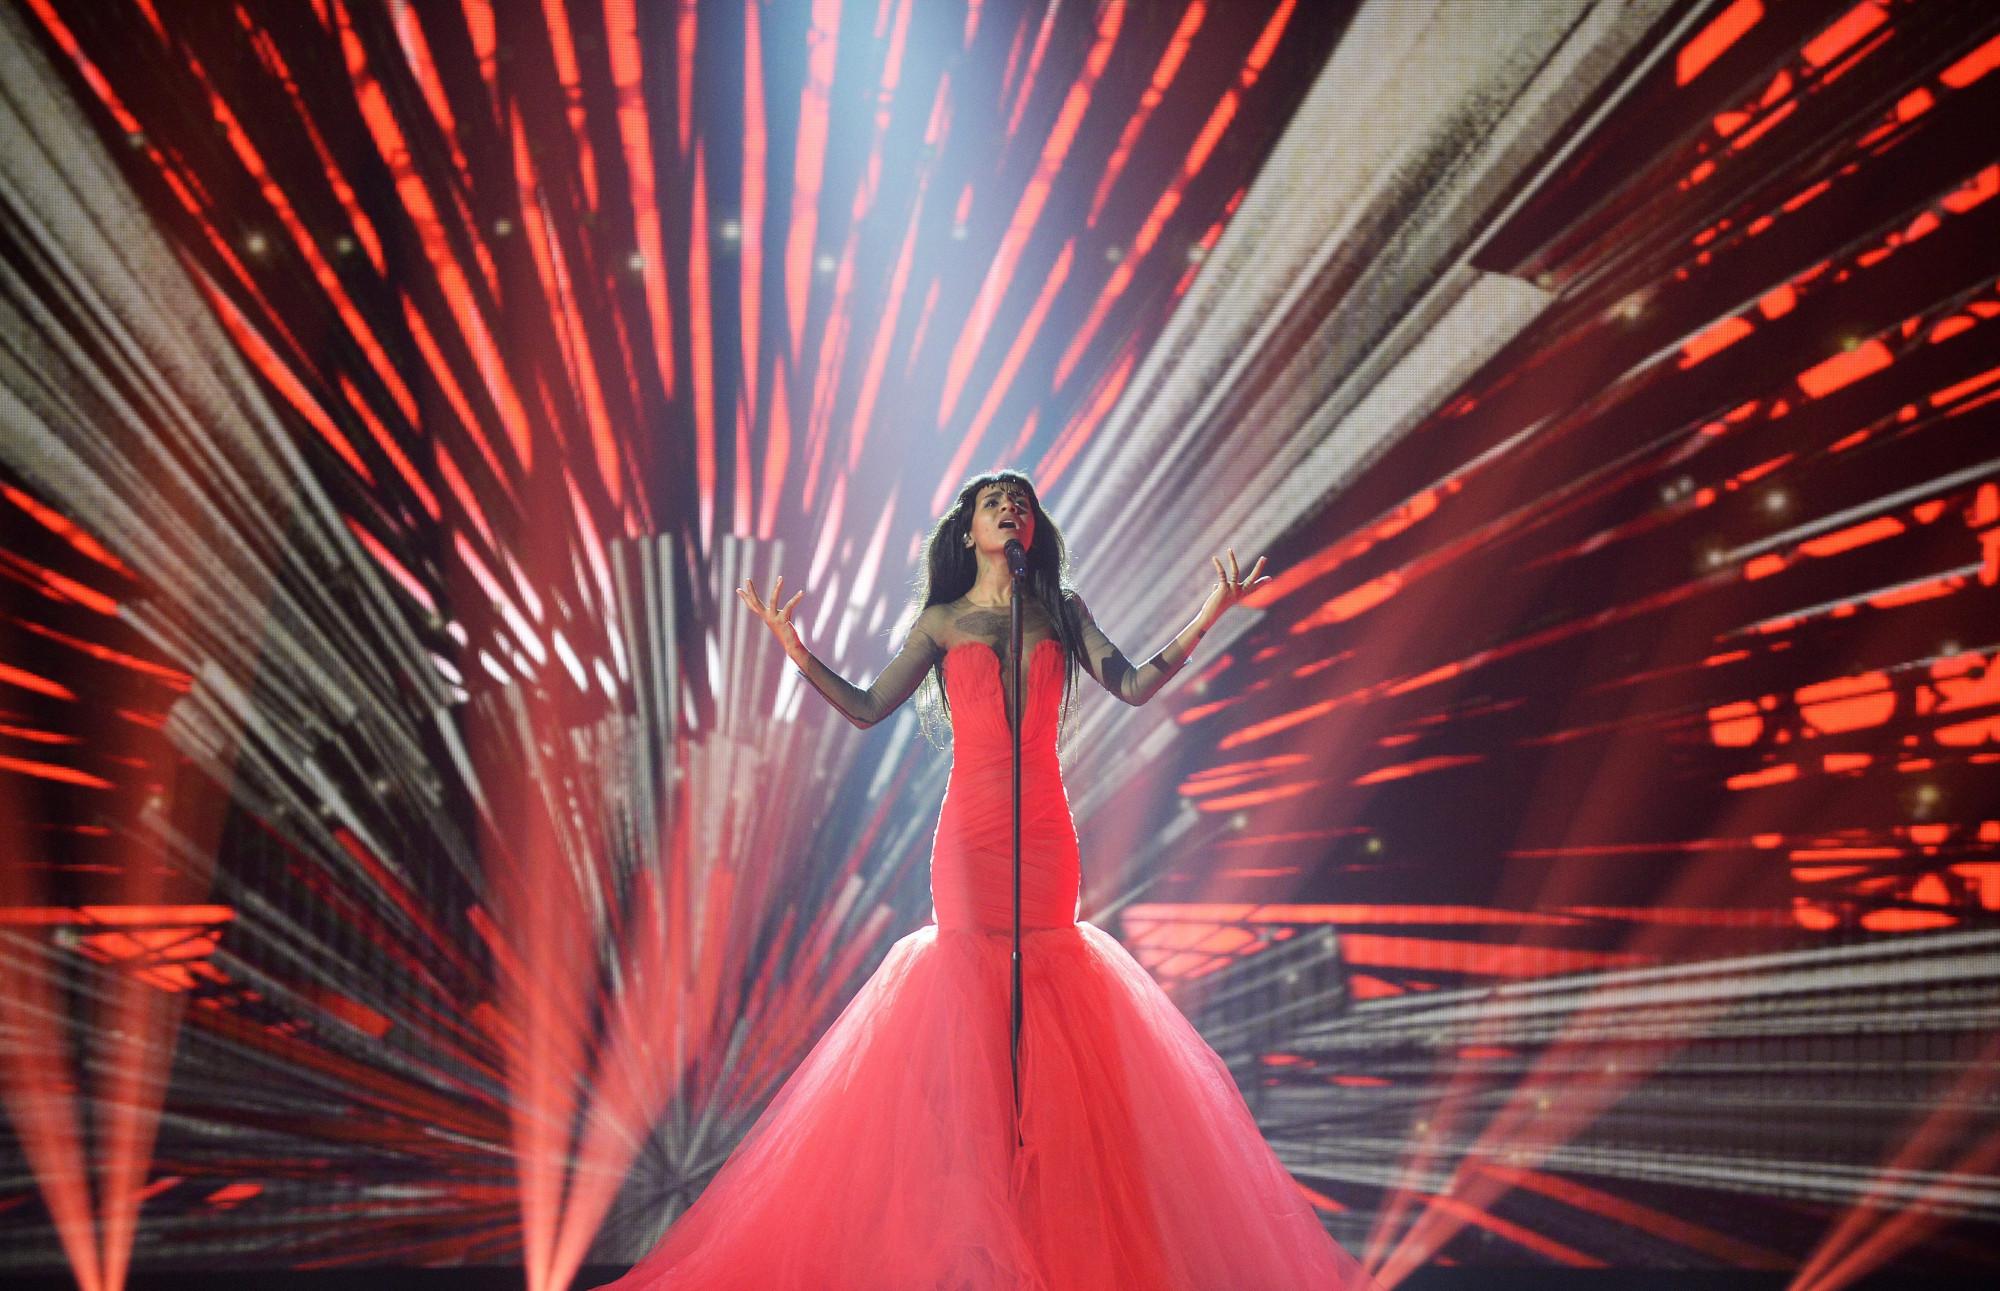 latvia-aminata-eurovision